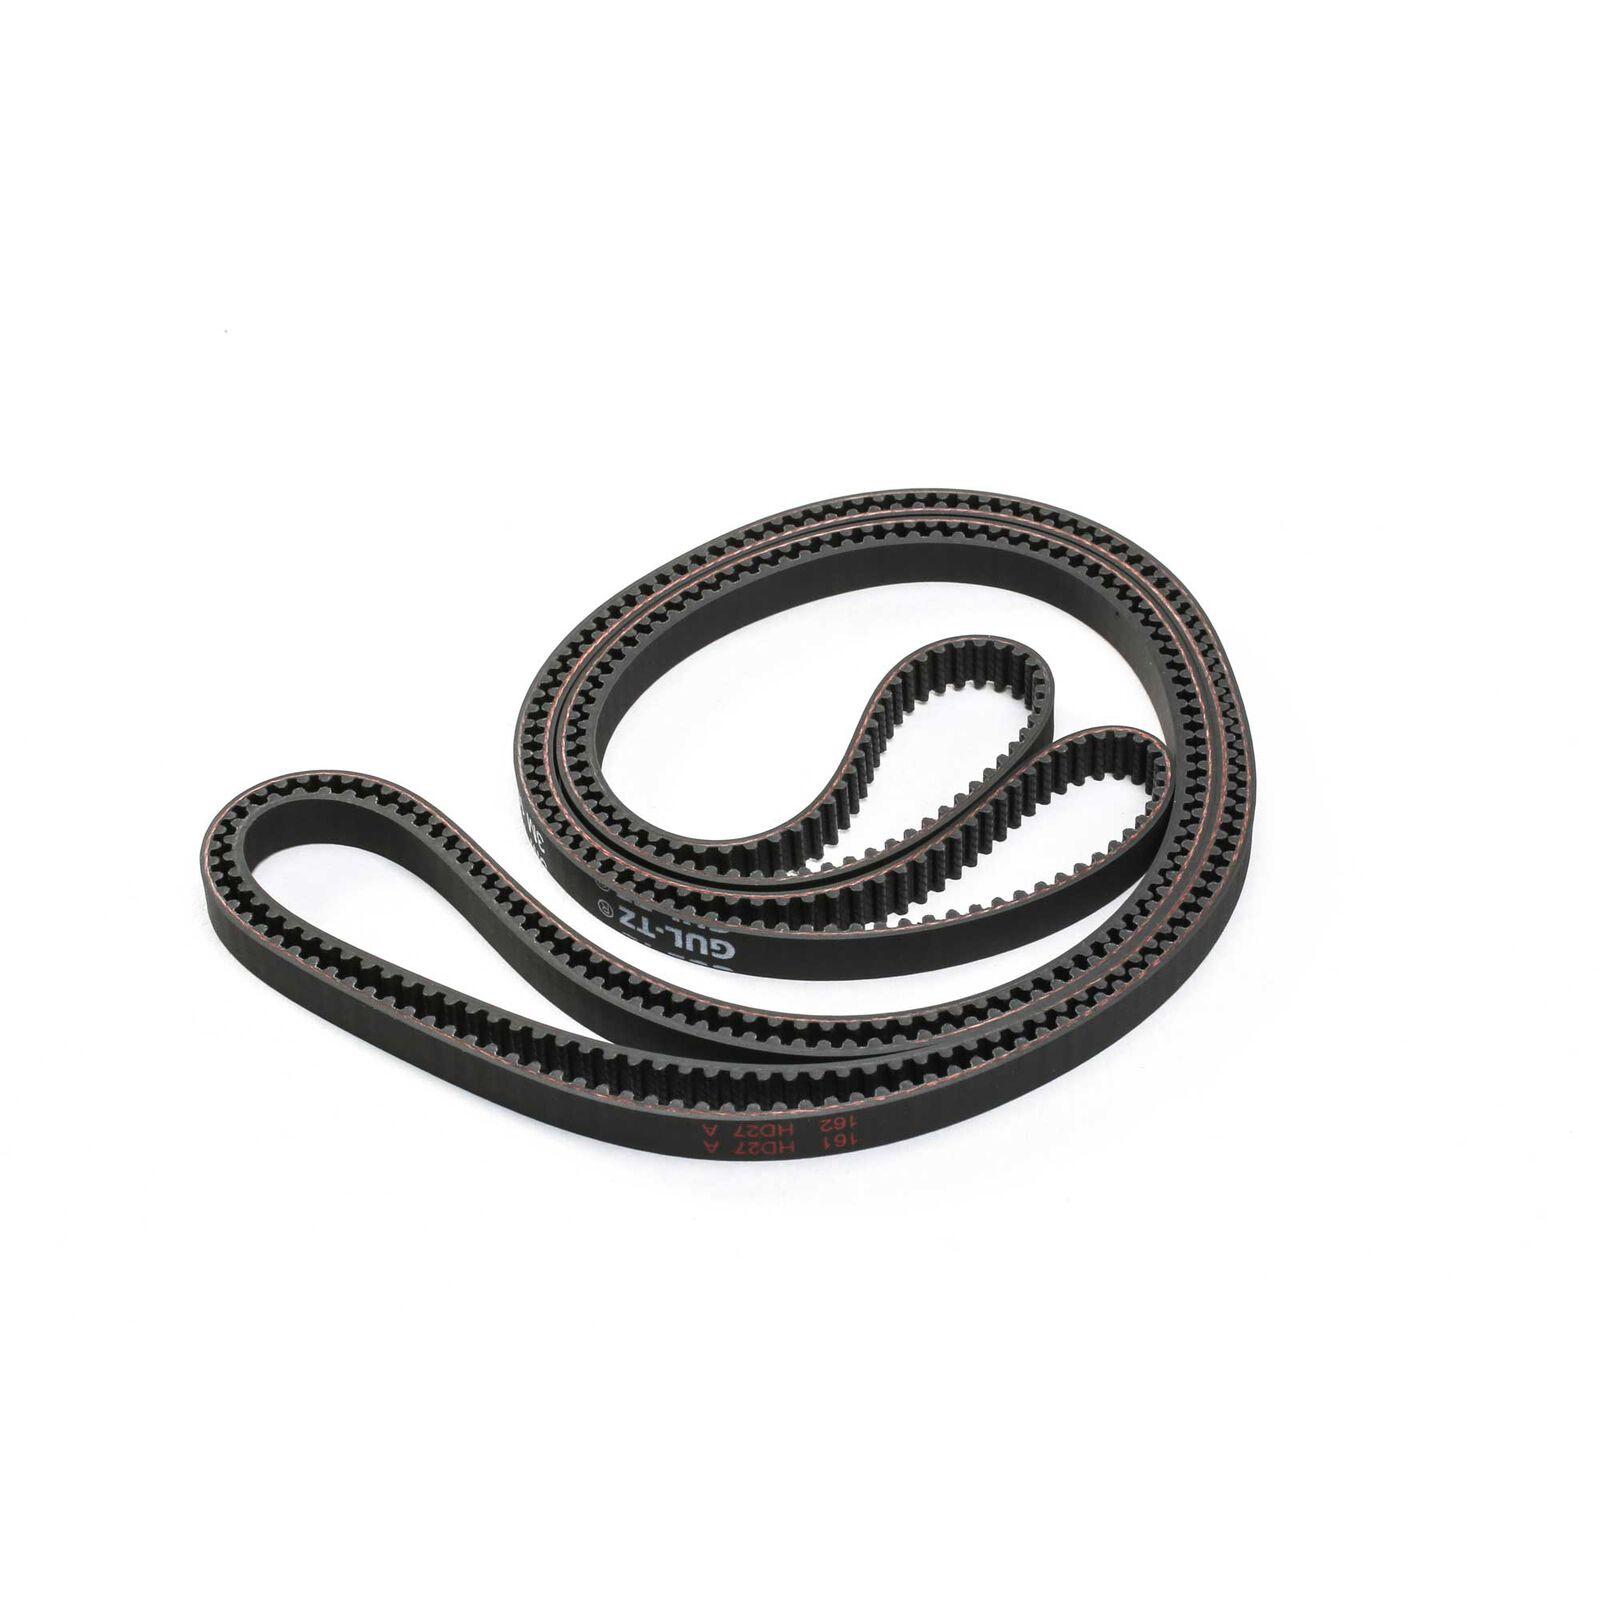 Tail Belt: Fusion 480 Stretch